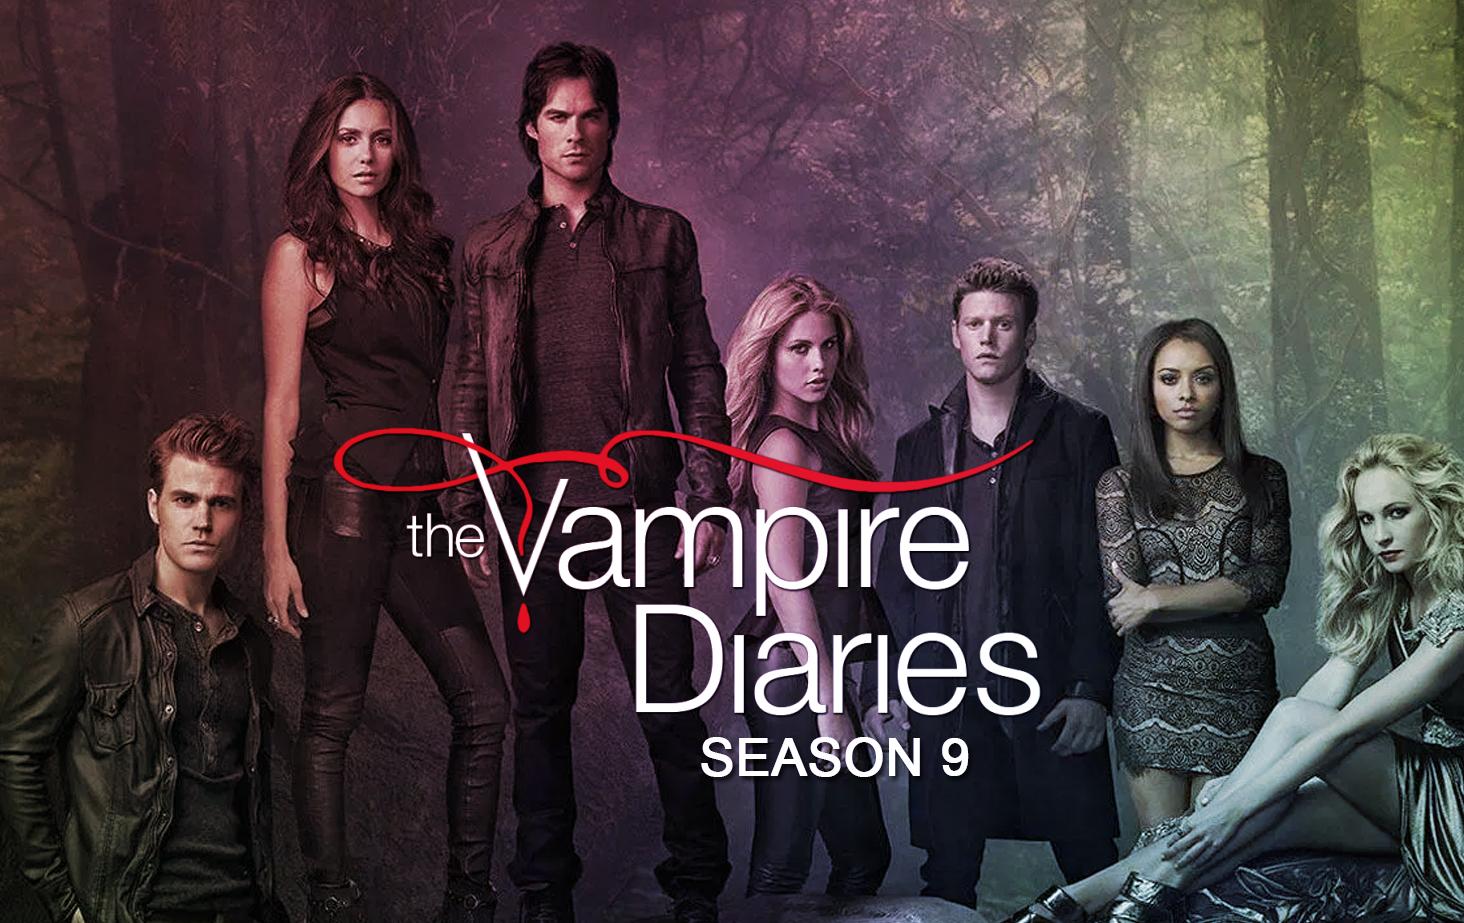 Vampire Diaries Season 9: Release Date